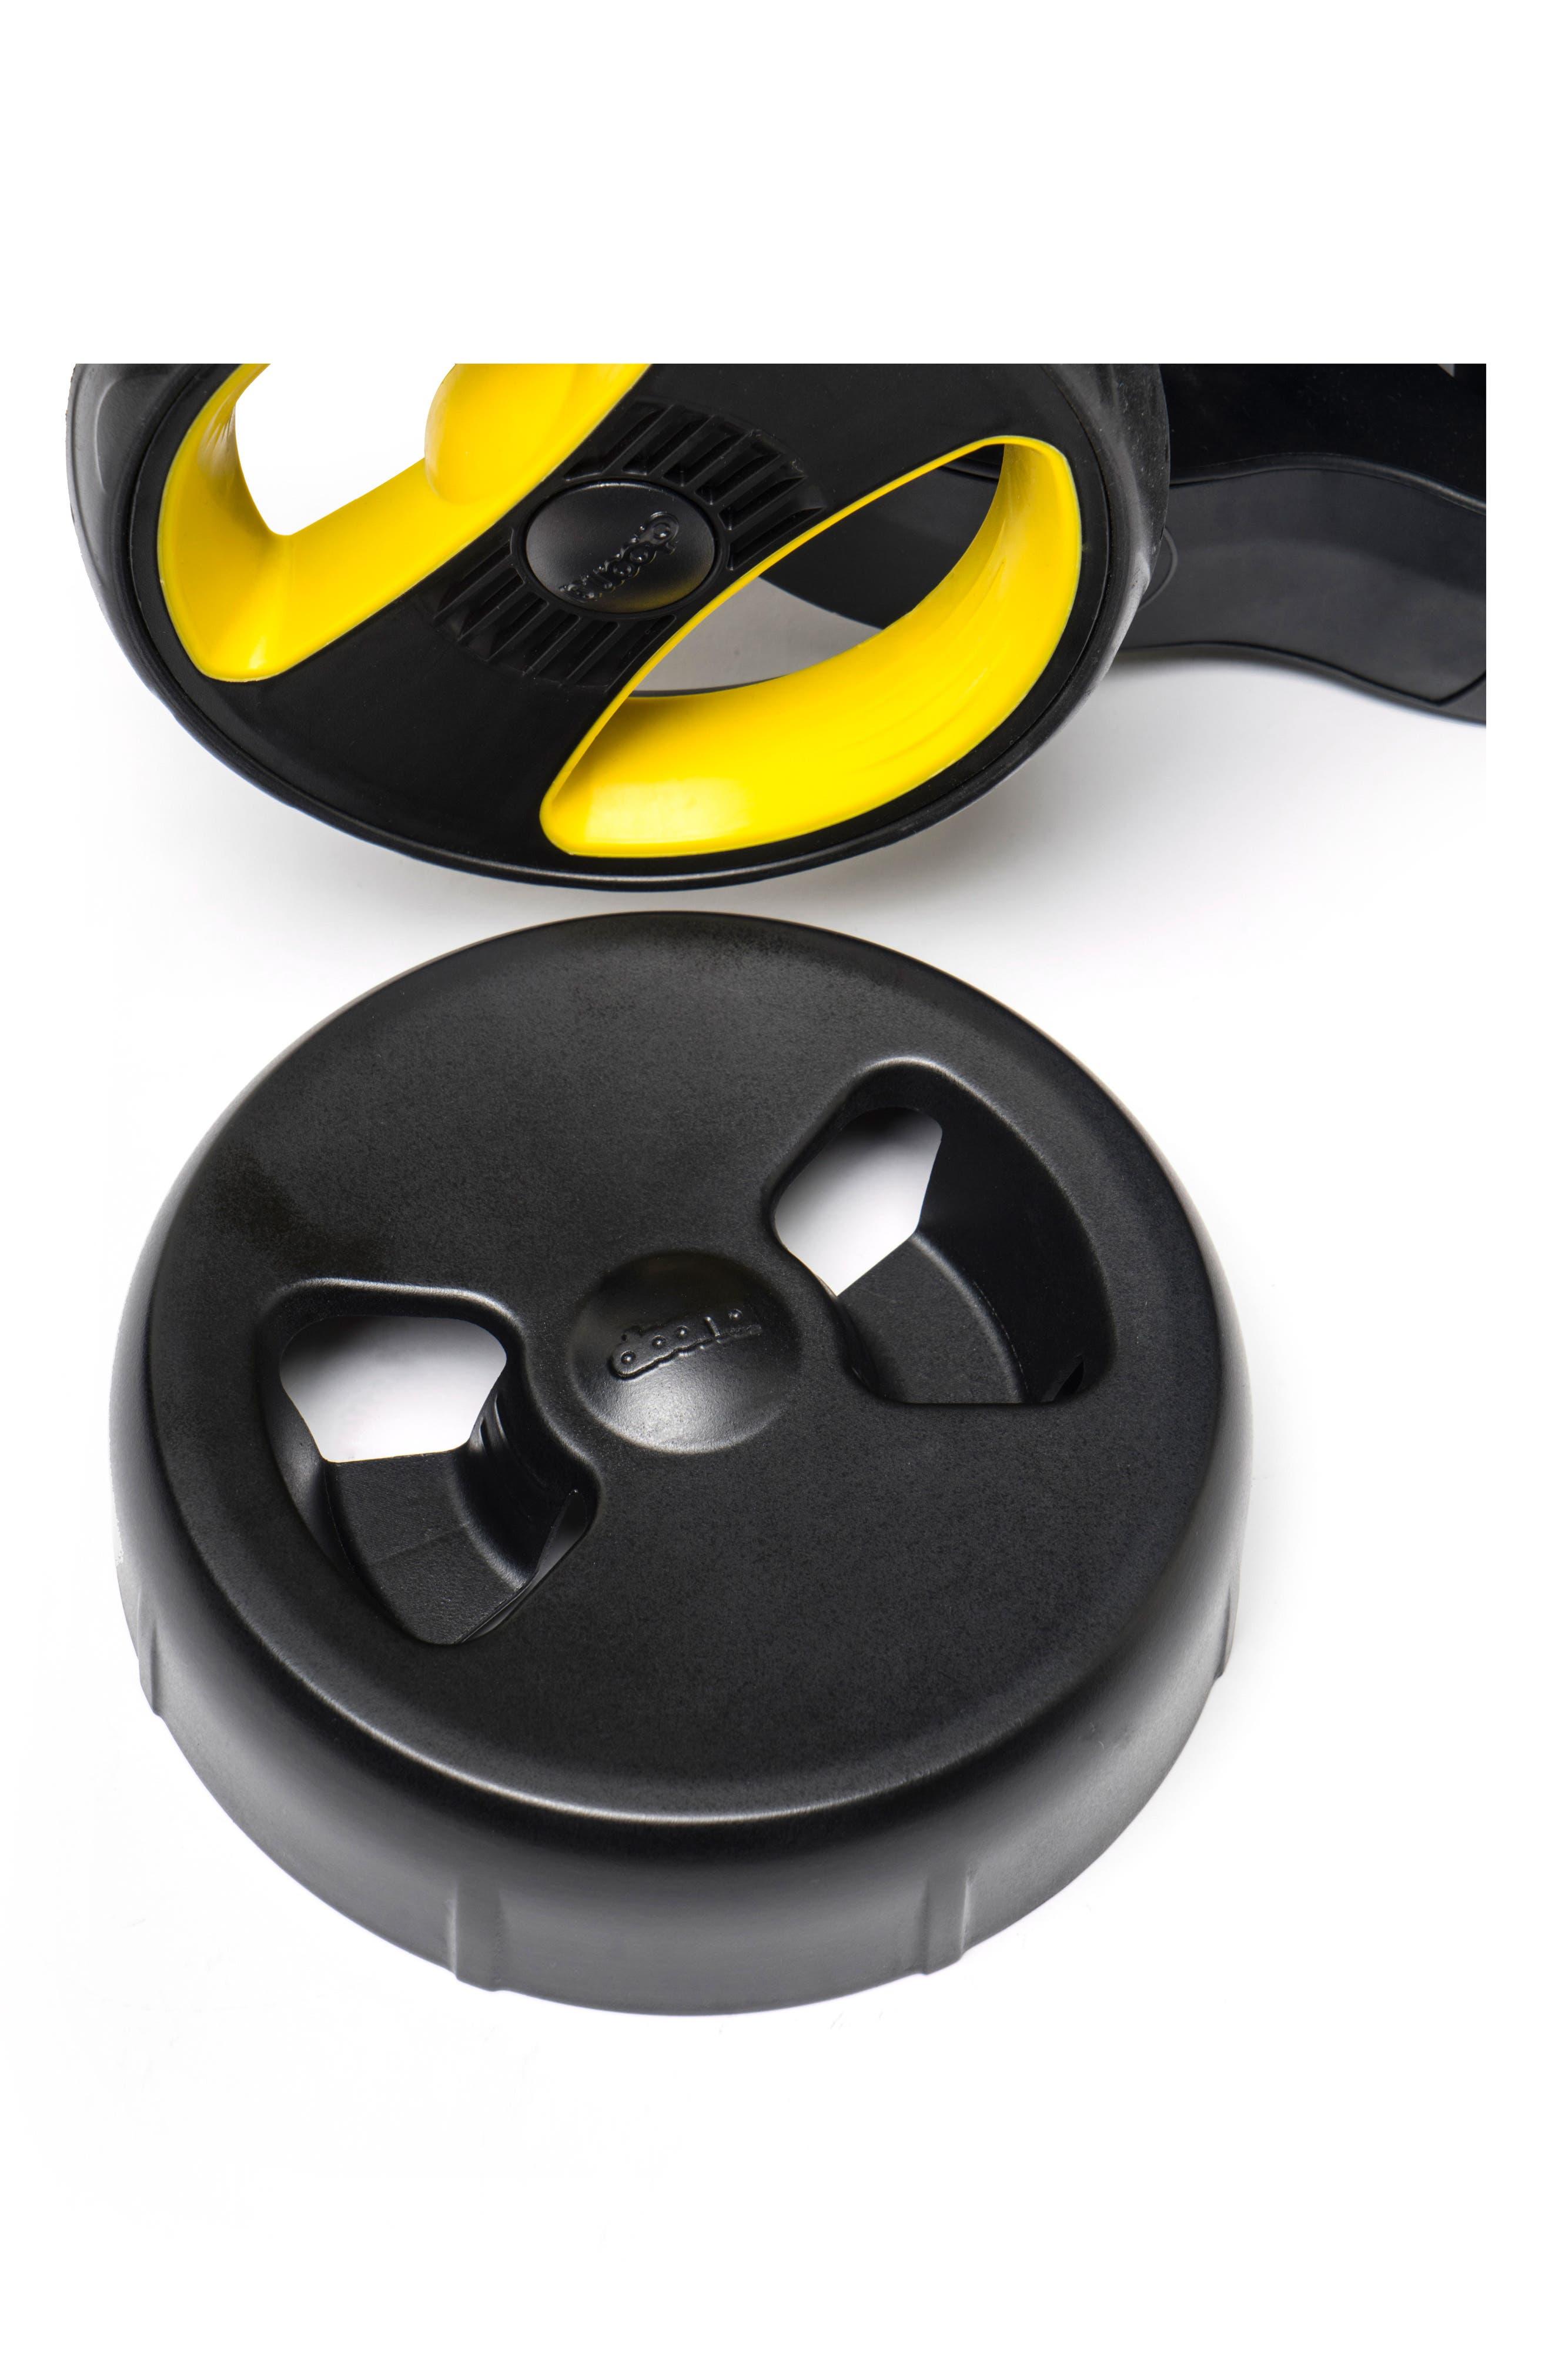 Wheel Covers,                         Main,                         color, Black